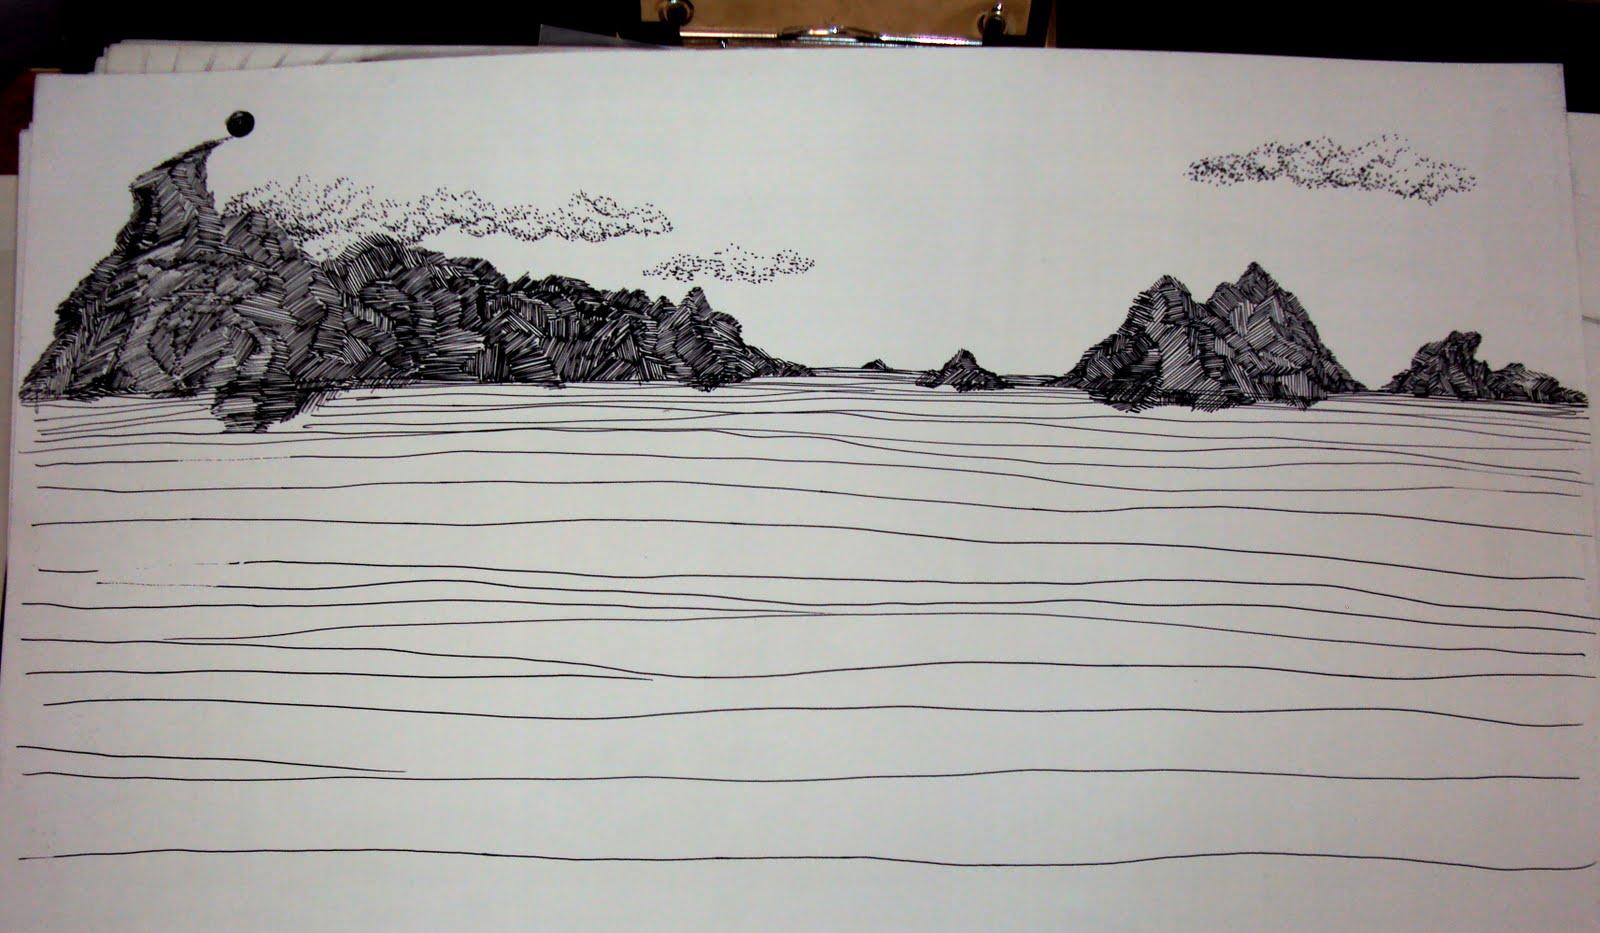 dibujo, arquitectura, arte, ideas, pensamientos, faltas ...